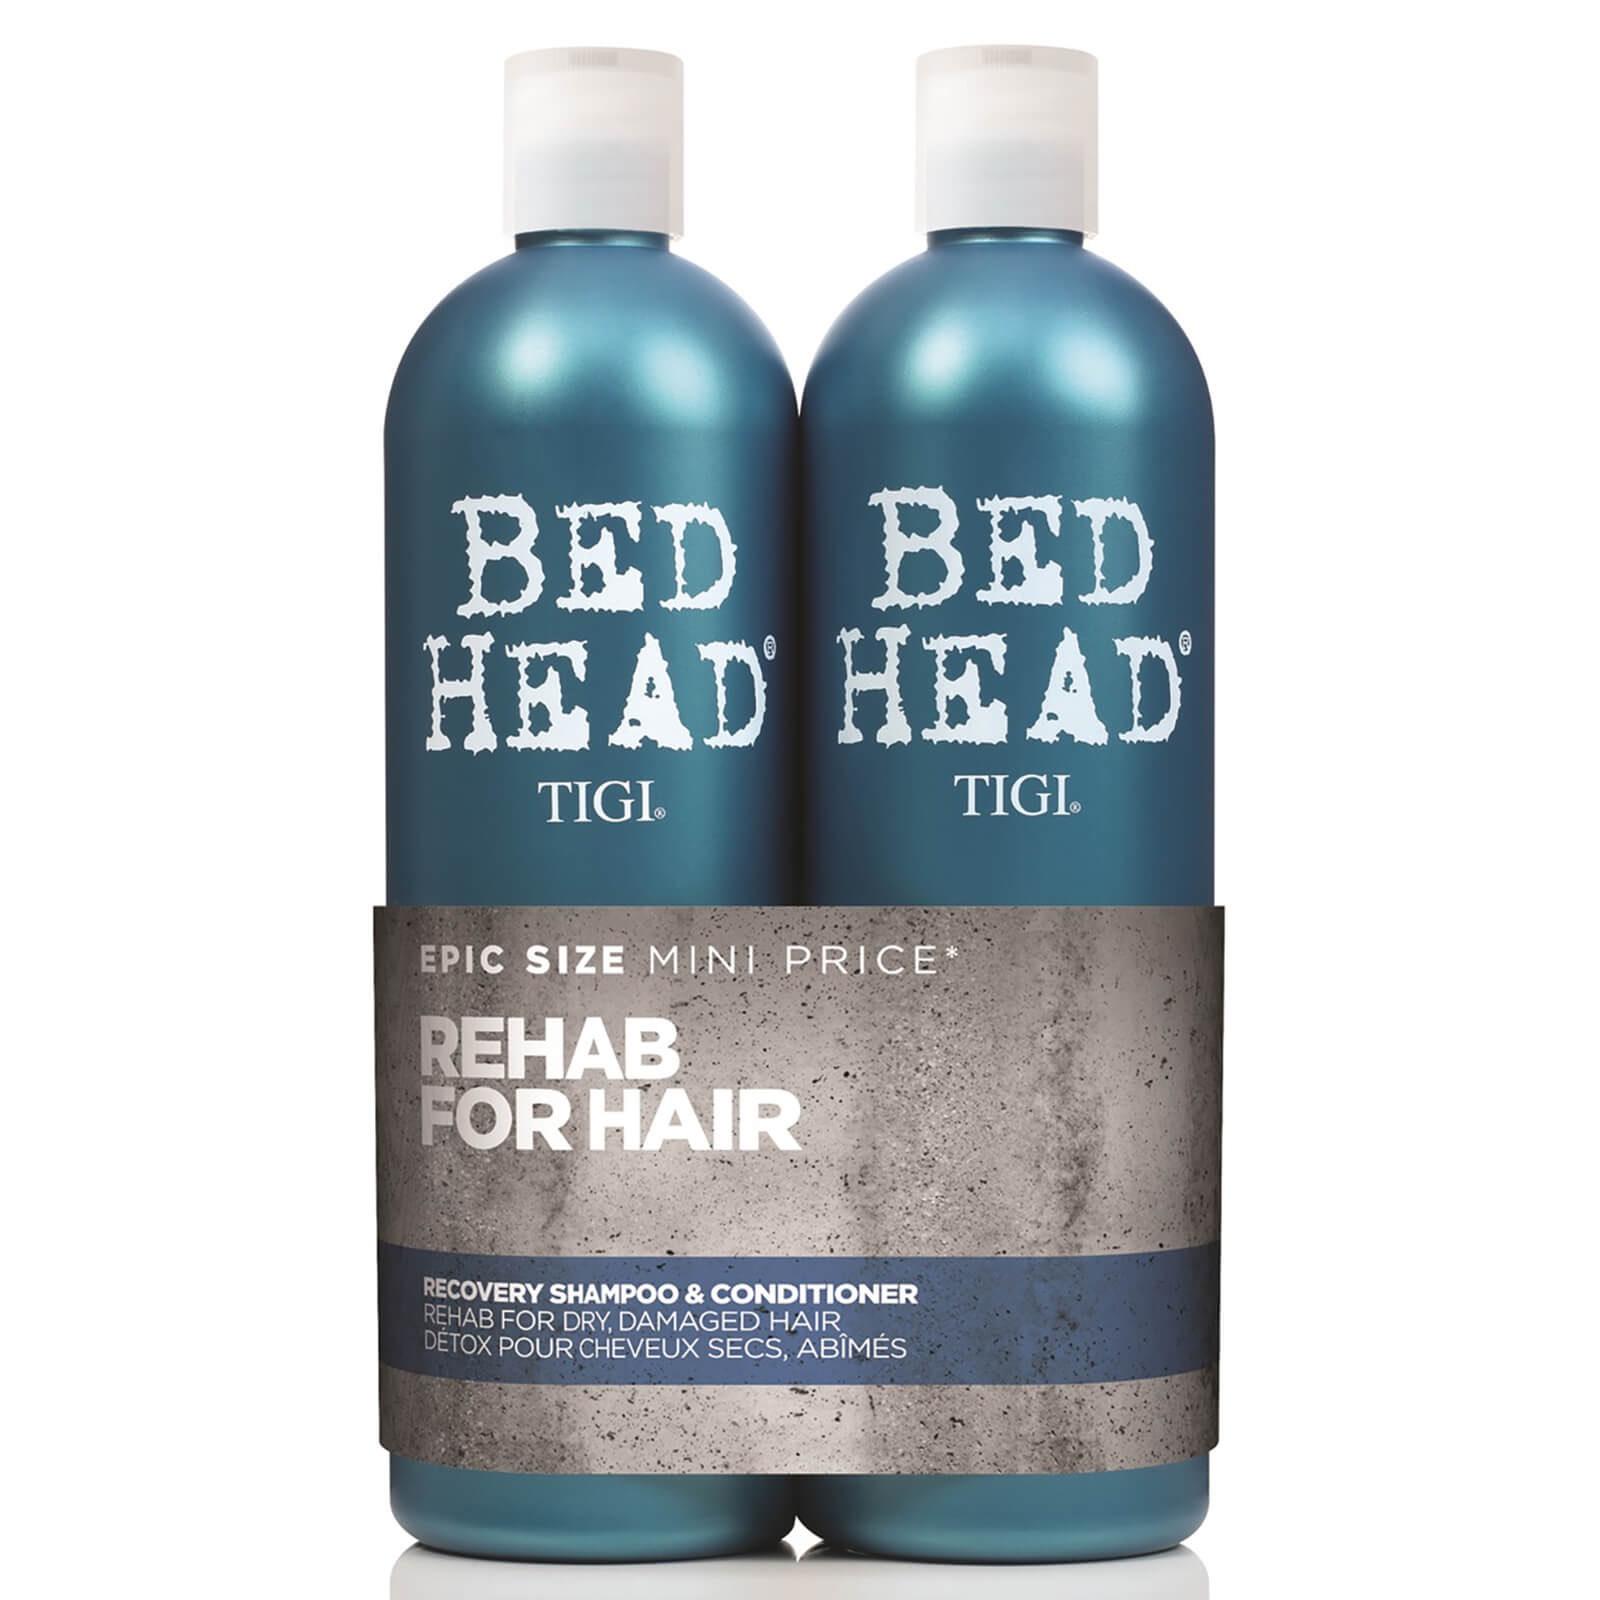 Various Tigi Shampoo @ Conditioner sets @ Amazon